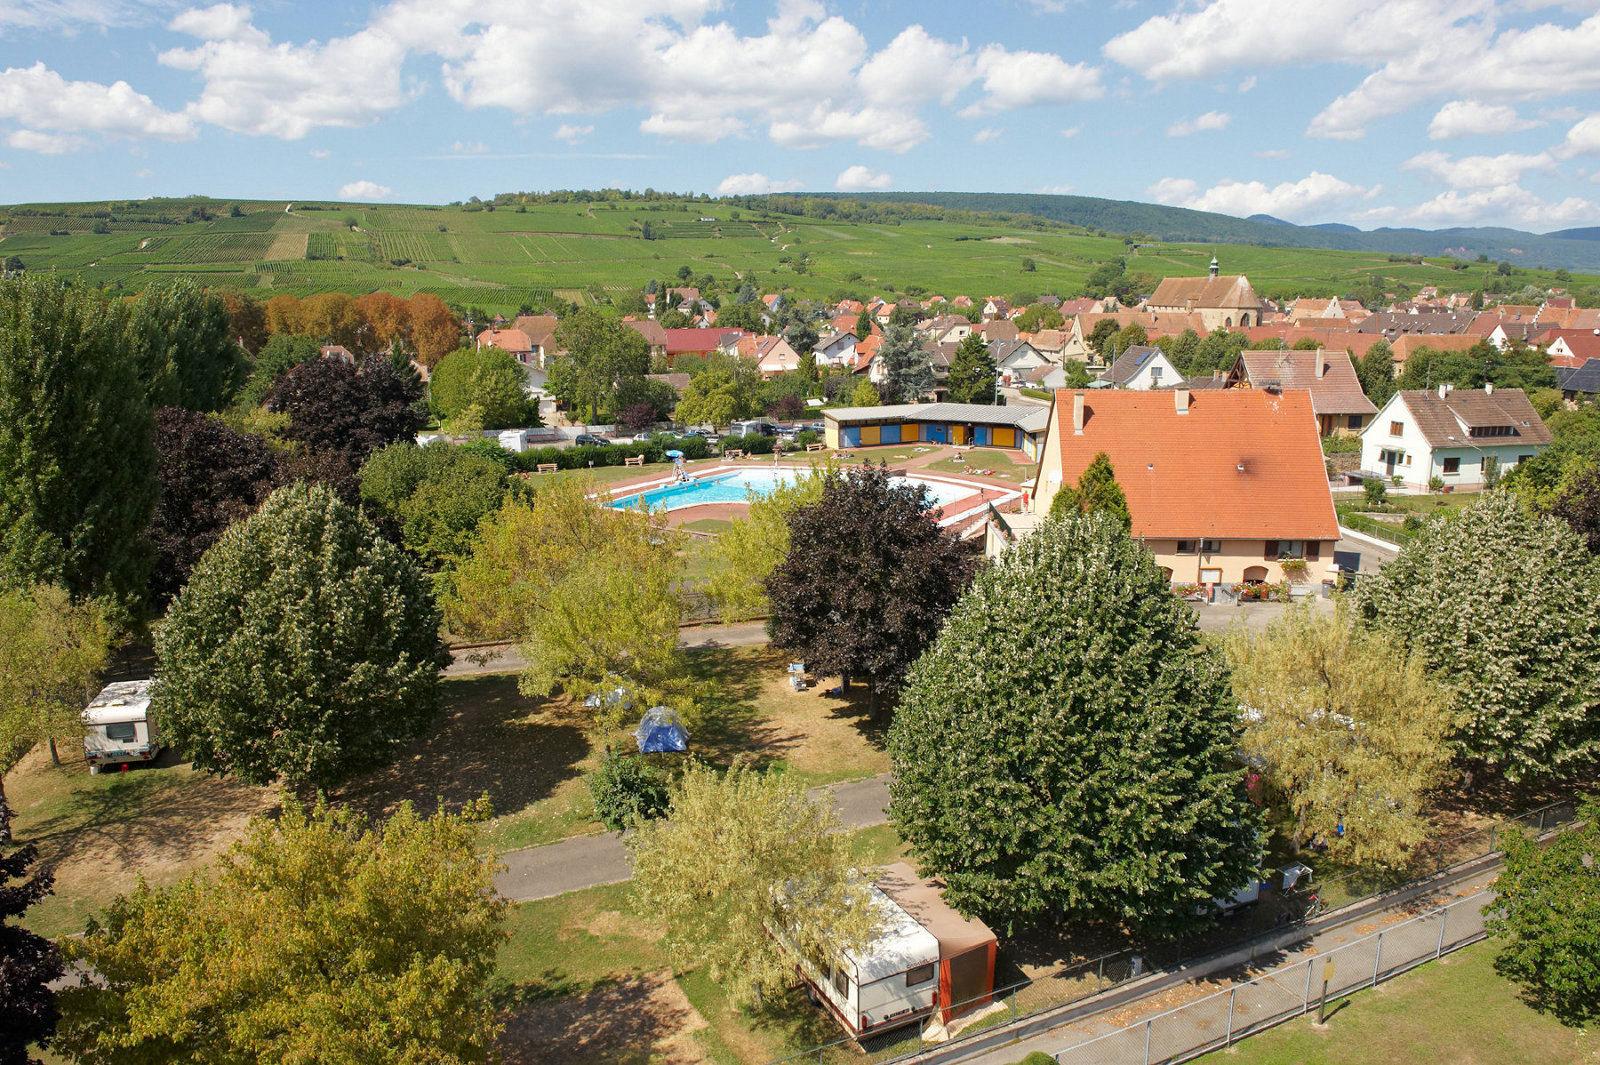 Camping municipal, Rouffach, Pays de Rouffach, Vignobles et Châteaux, Haut-Rhin, Alsace